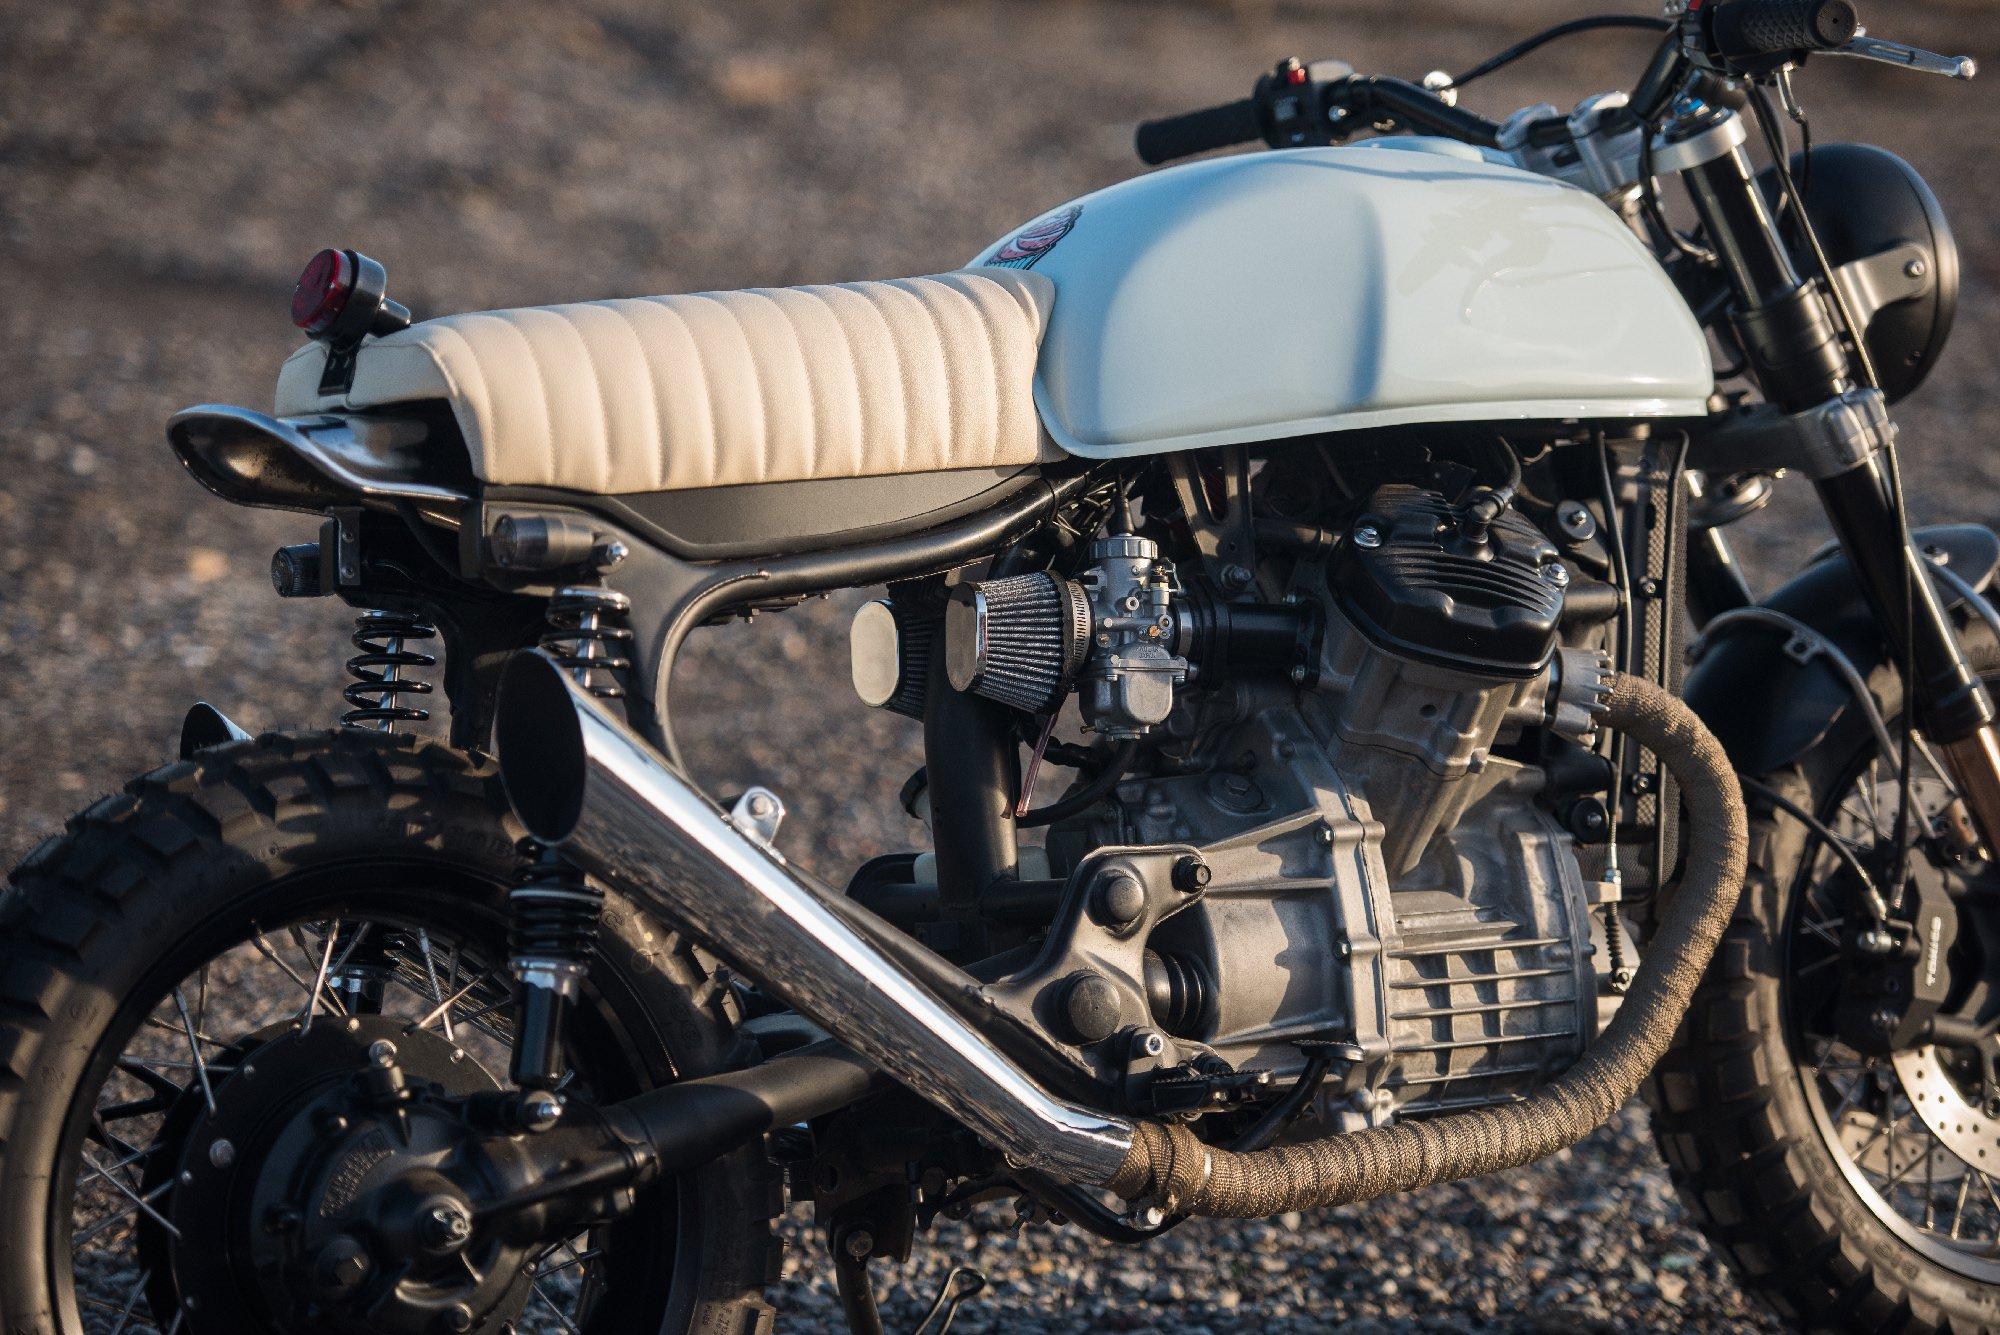 Honda CX500 Motorcycle 8